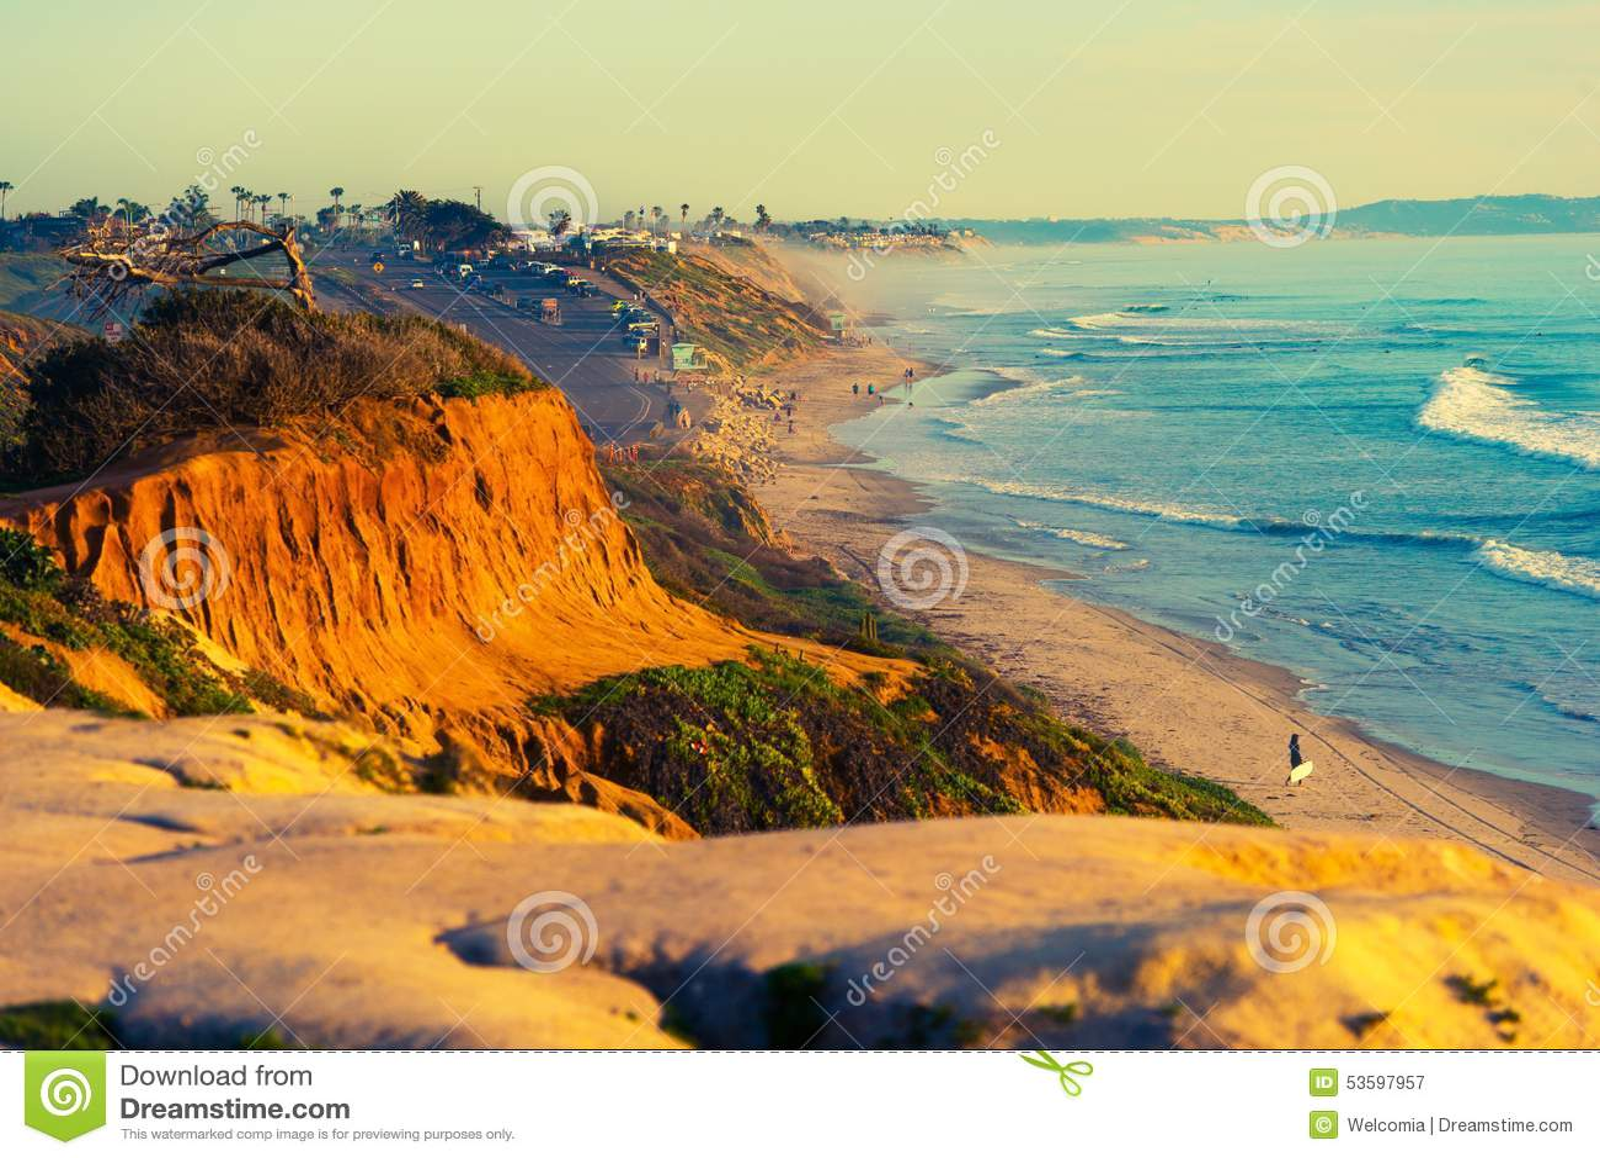 Encinitas海滩在加利福尼亚